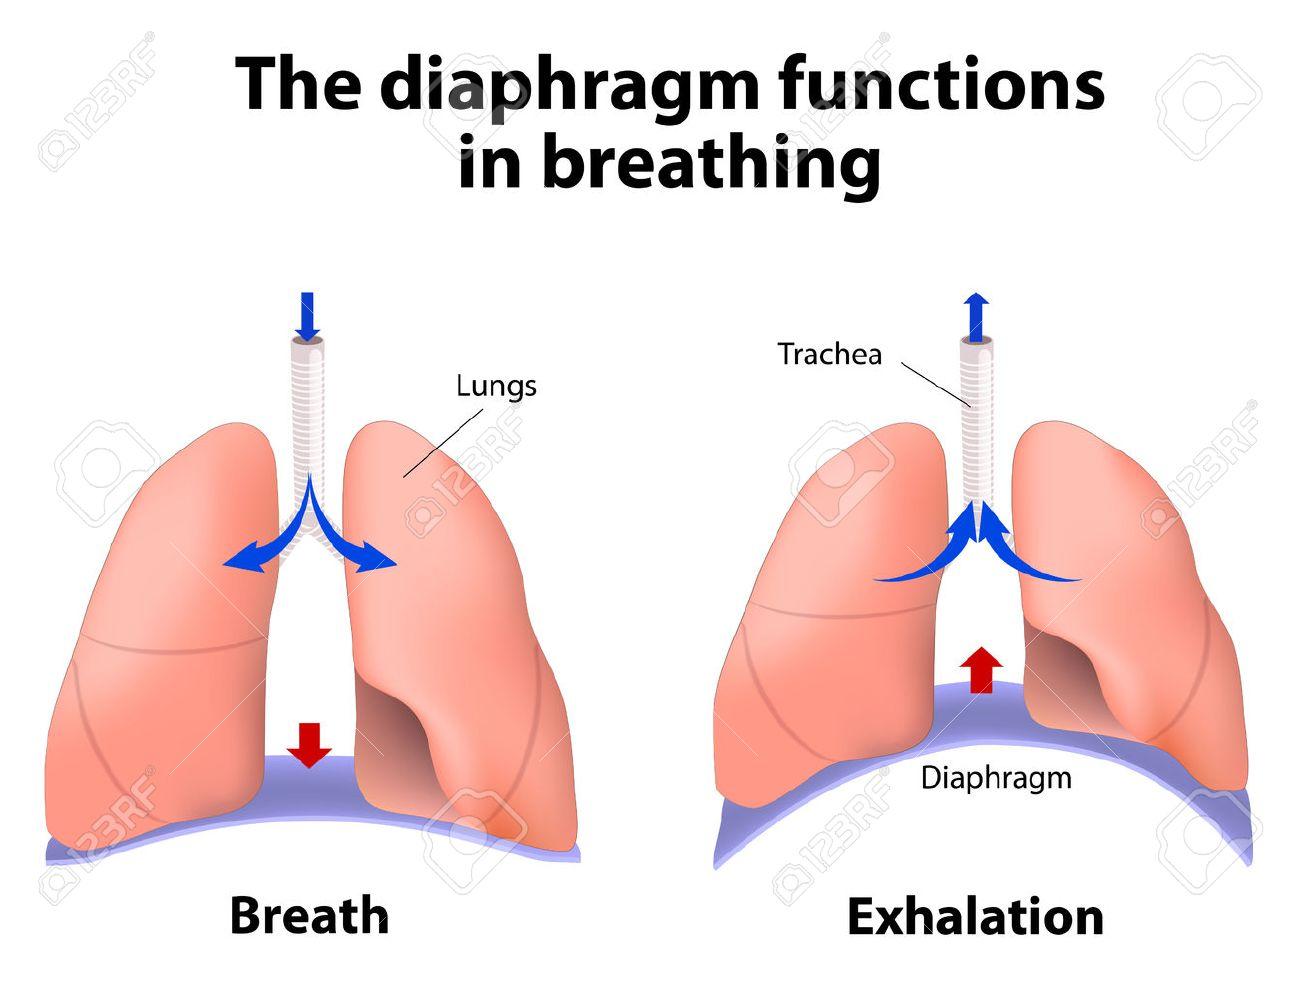 diaphragm functions in breathing. breath and exhalation. enlarging, Human body